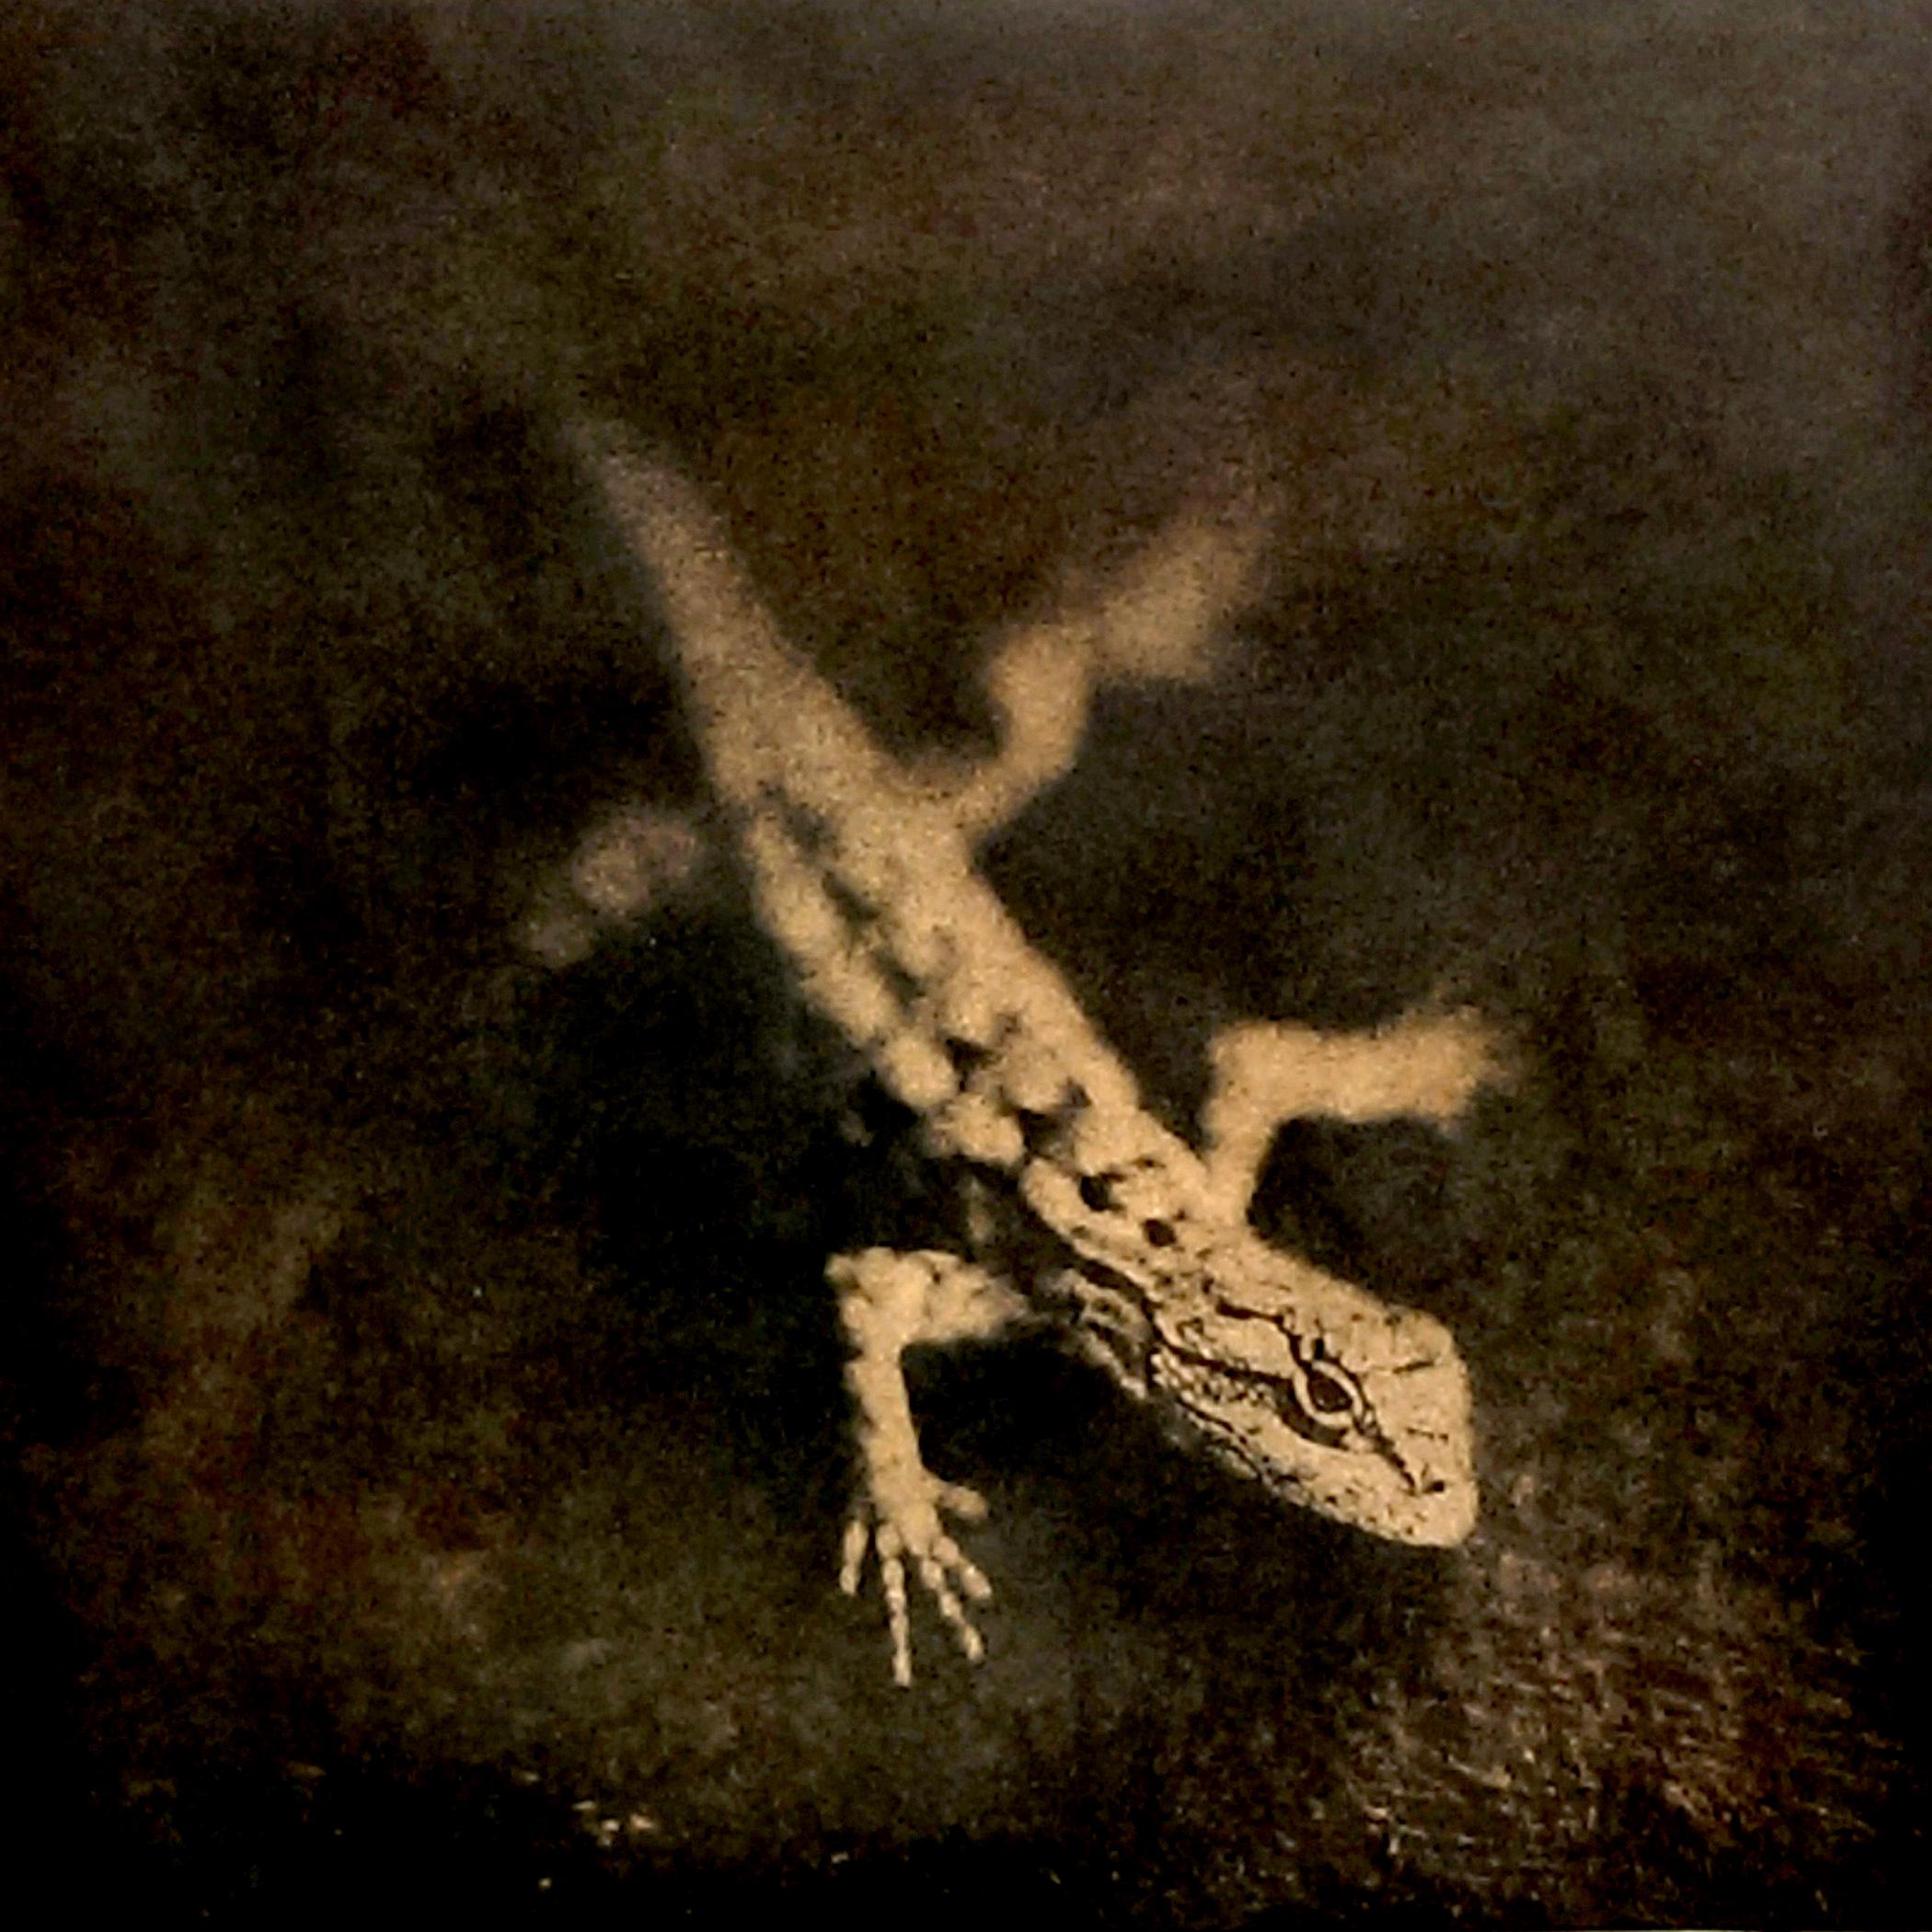 Texas Spiny Lizard, 2015